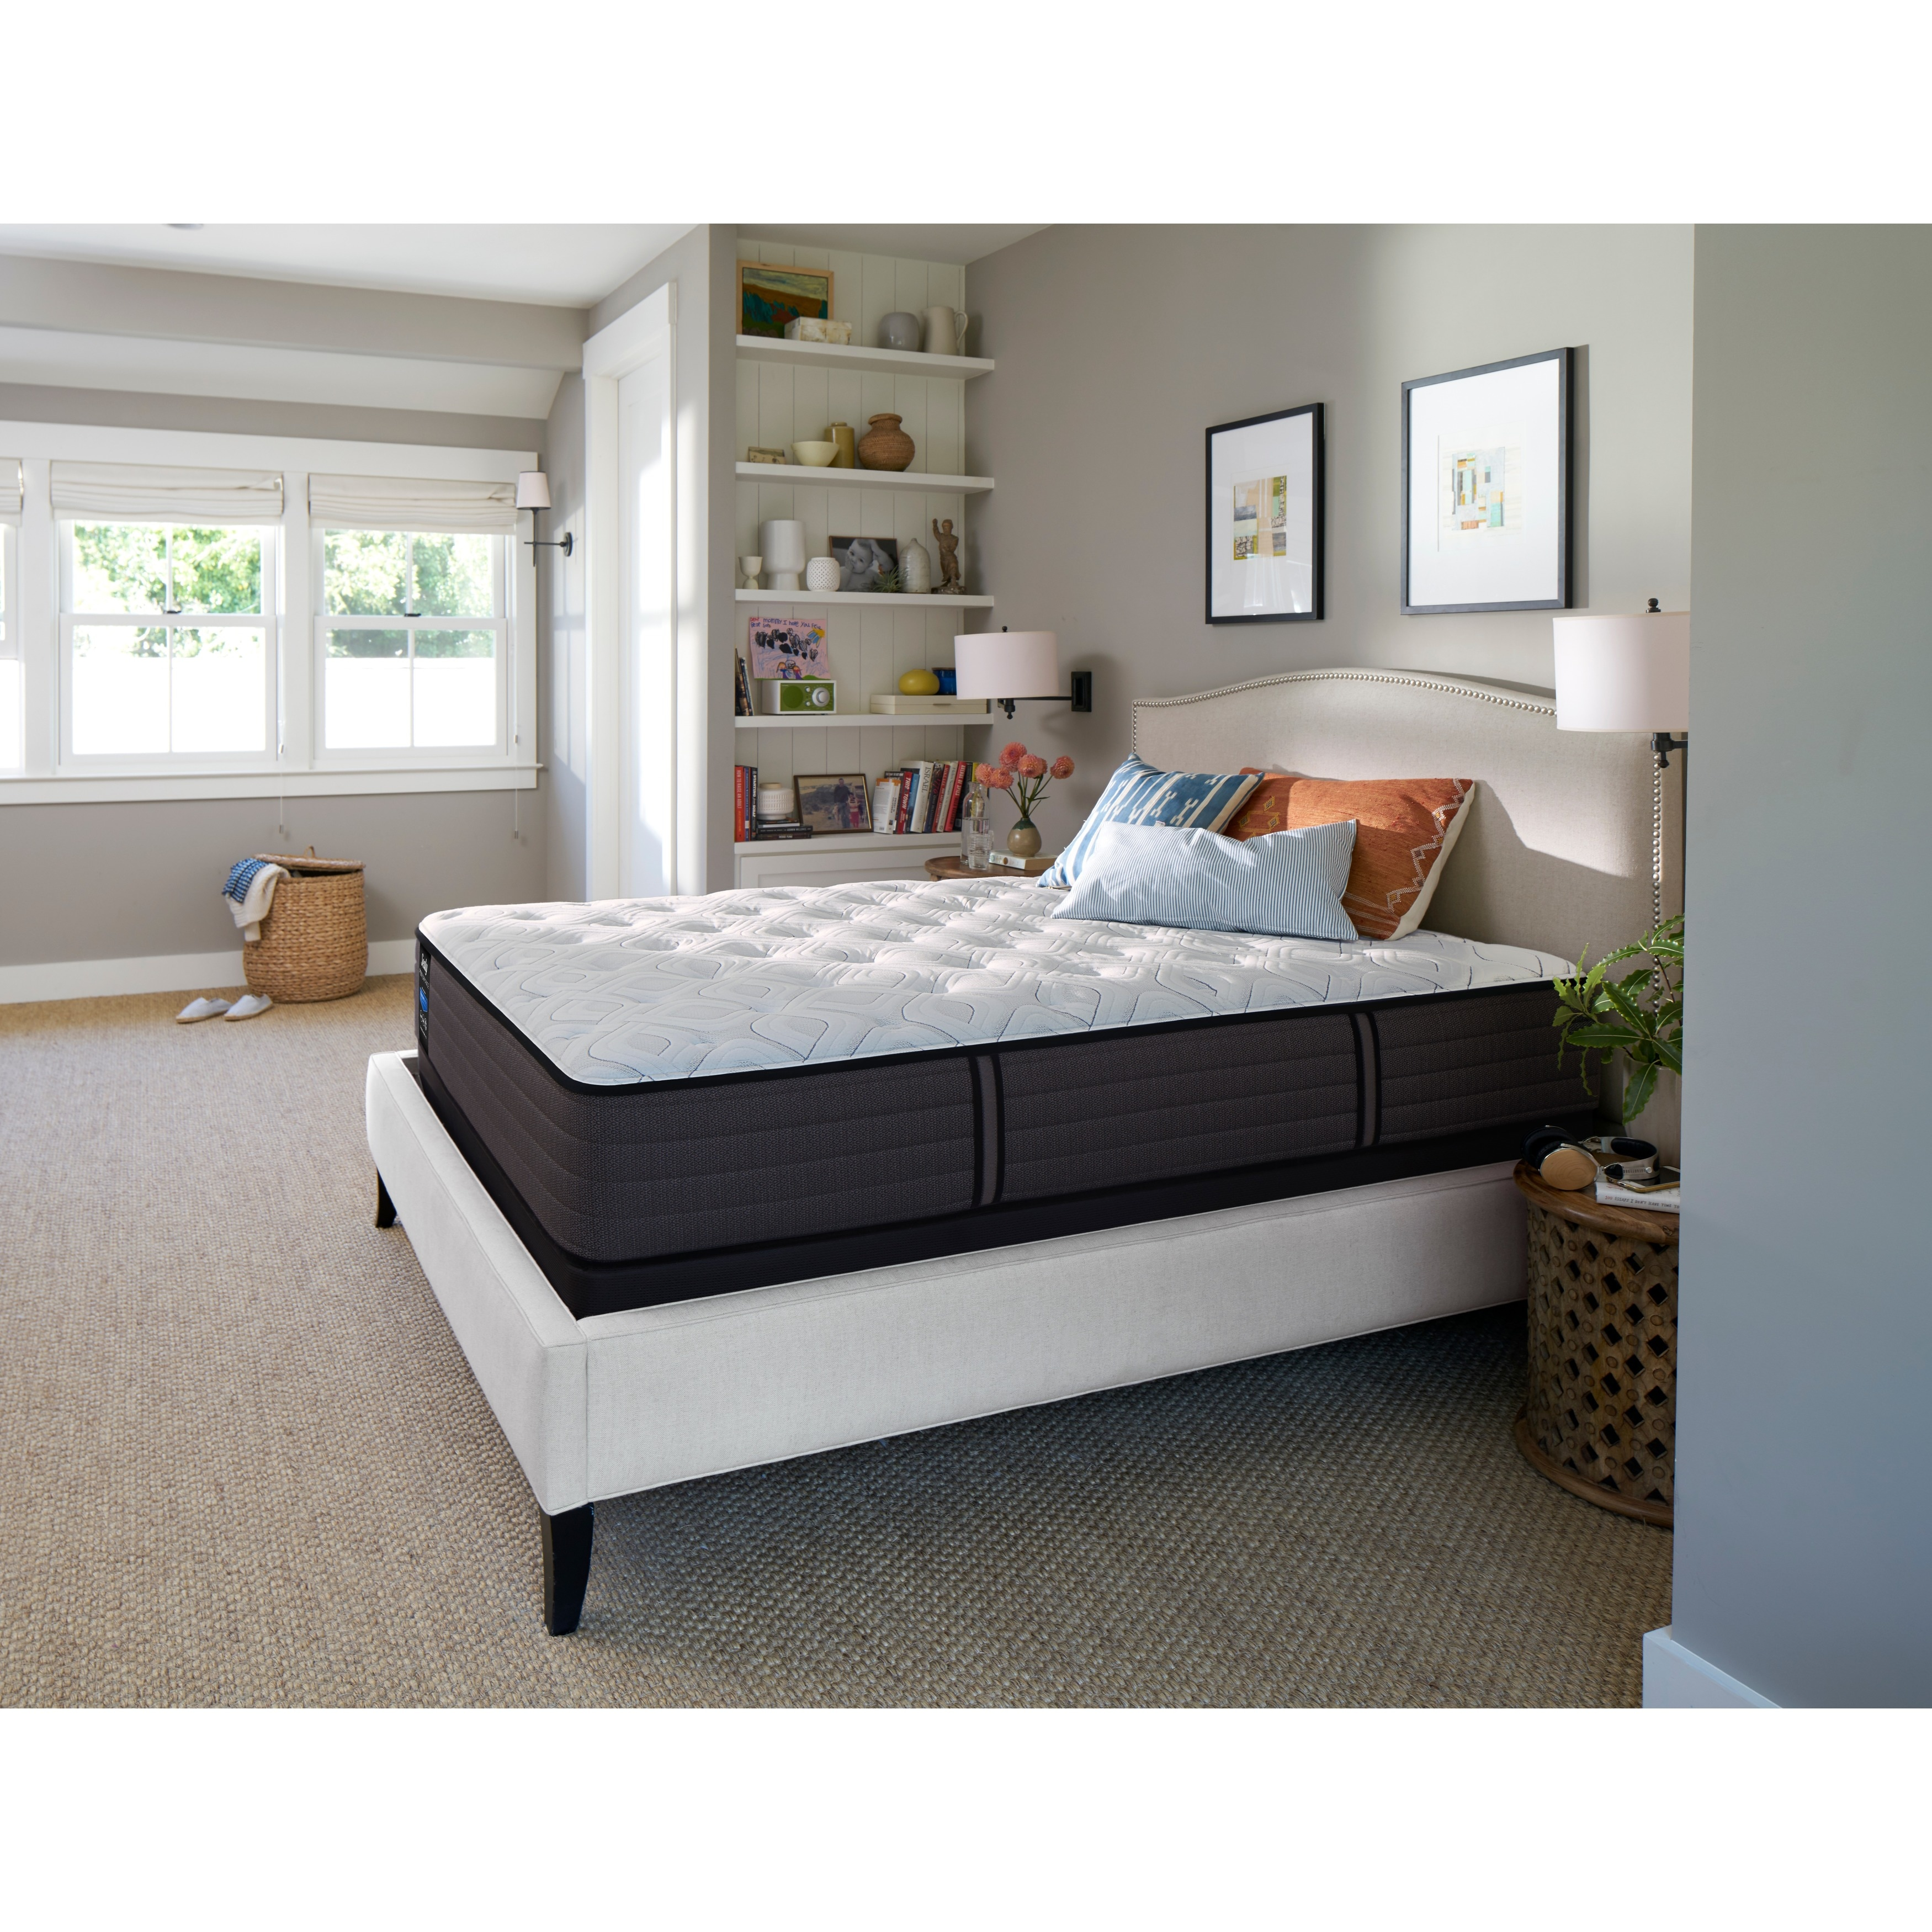 sealy response performance 12 5 inch cushion firm twin xl mattress